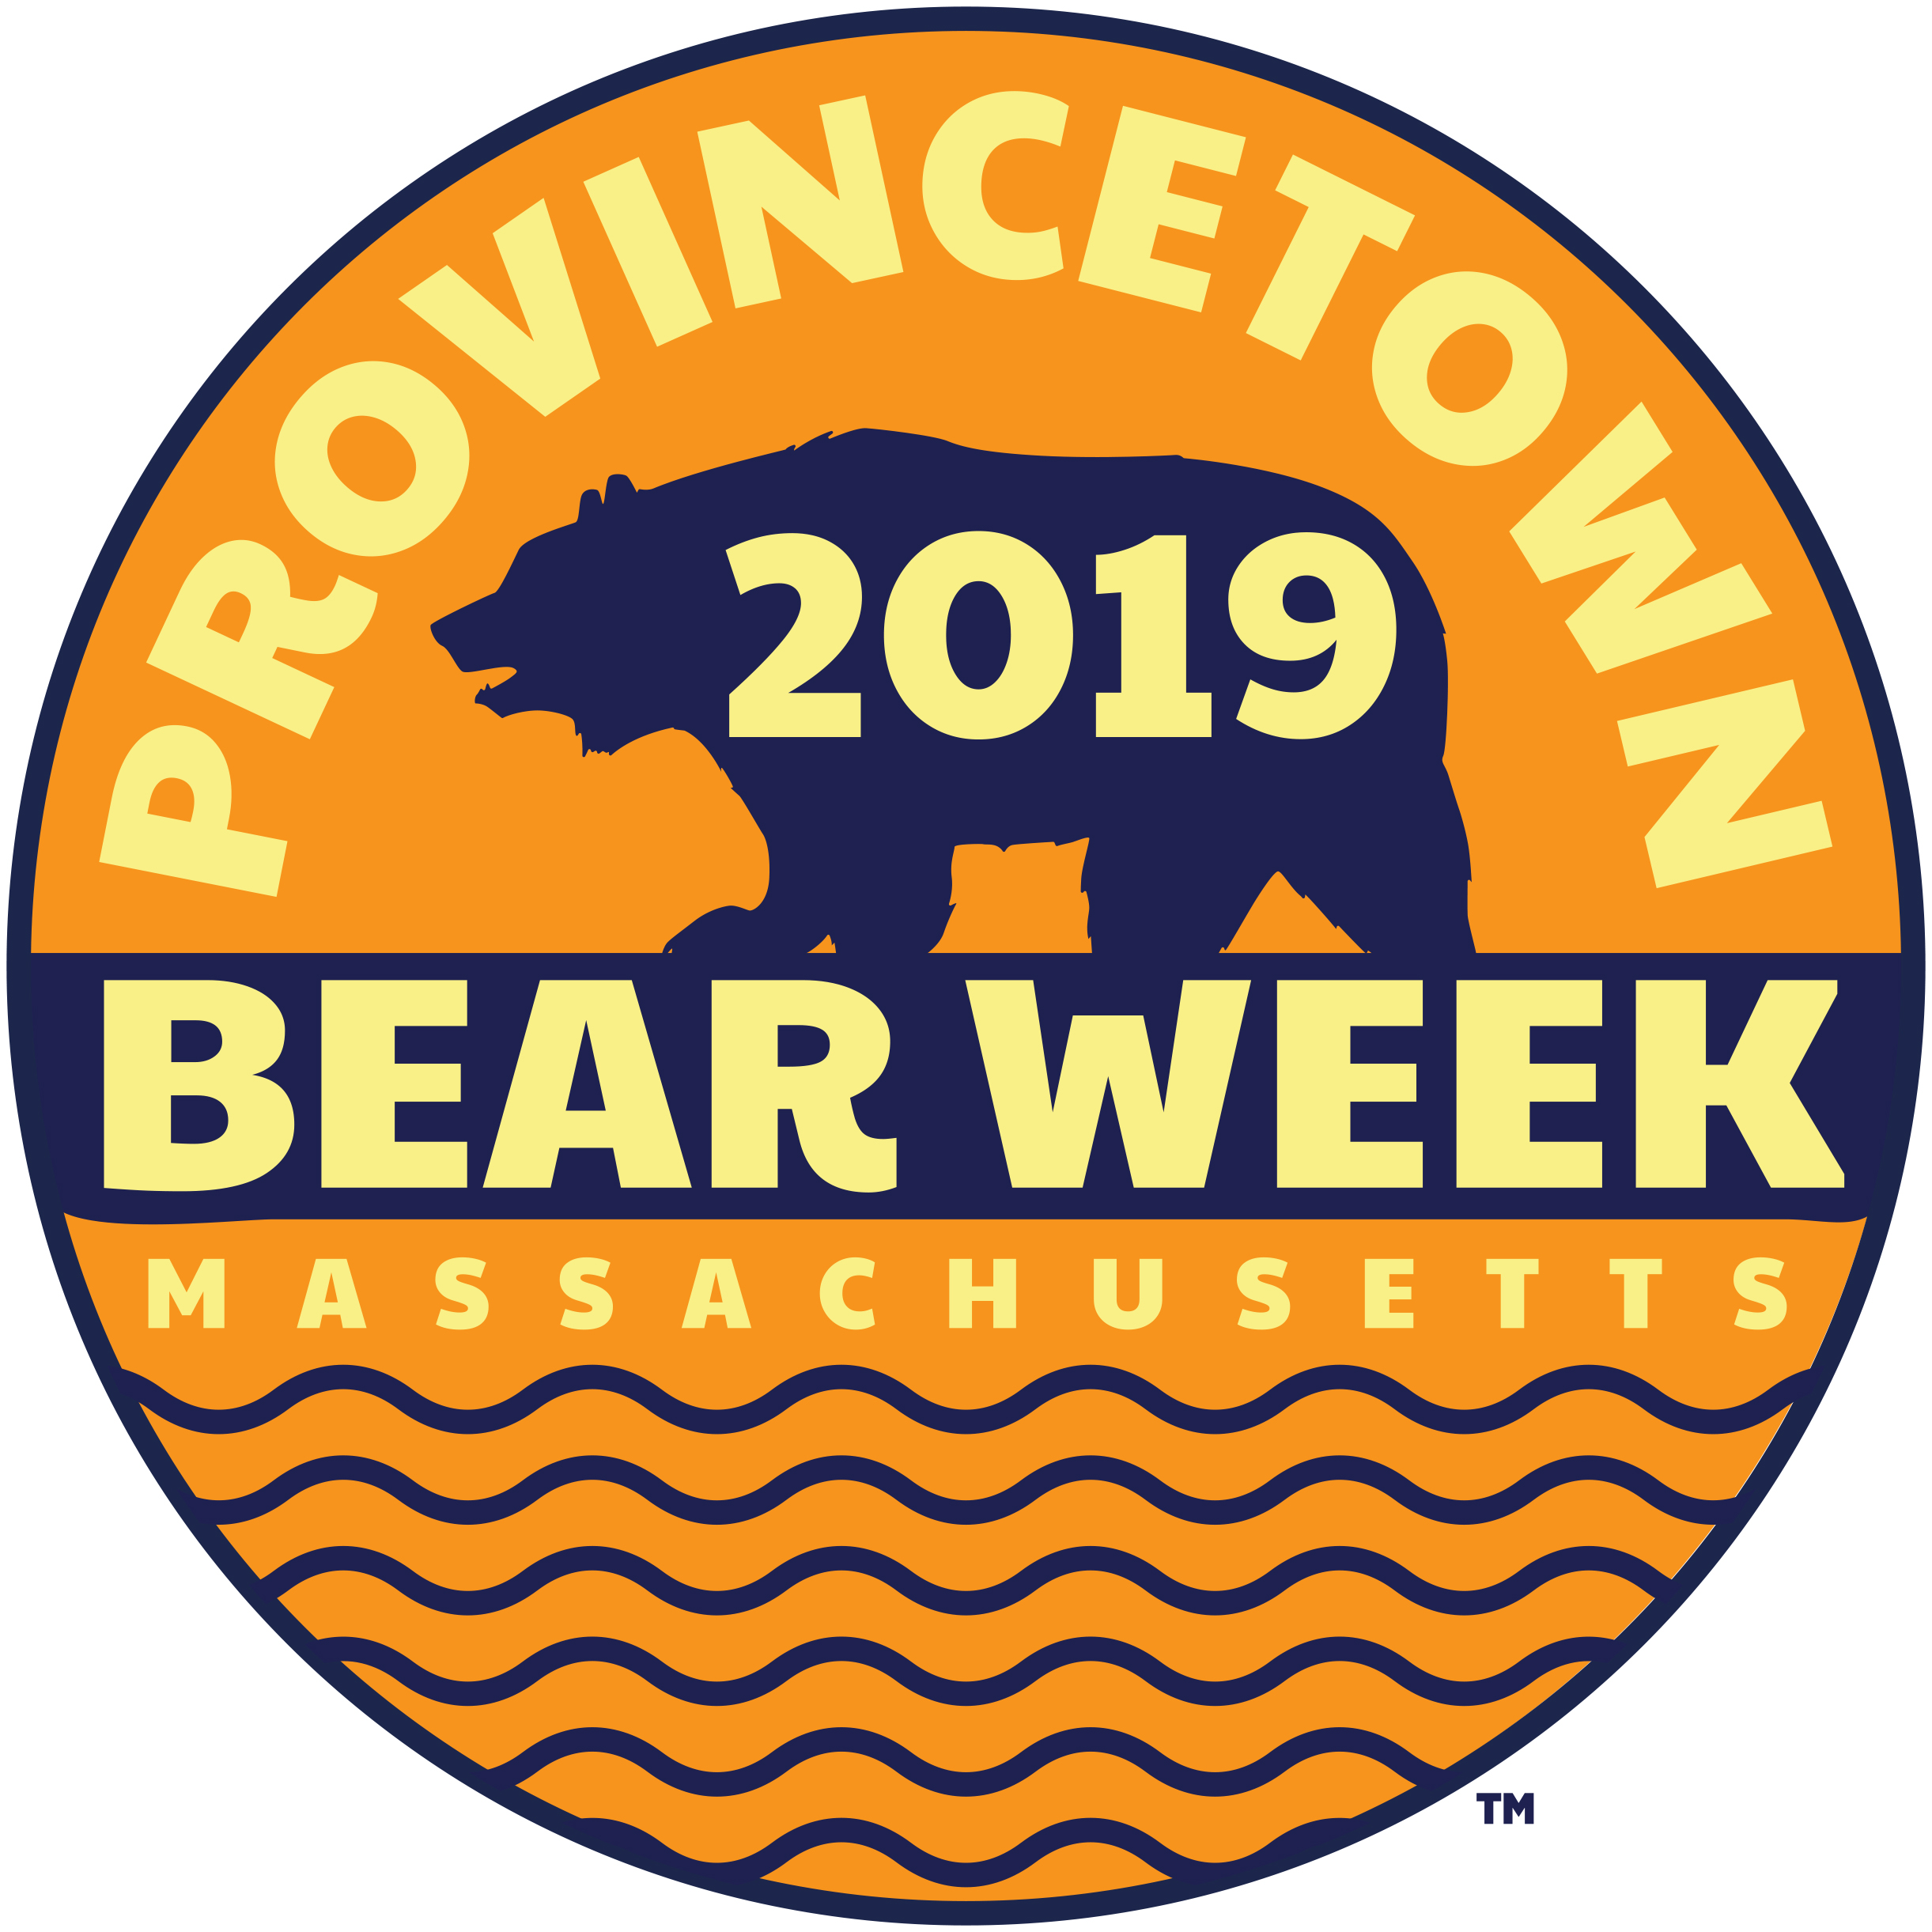 bear-week-2019-regt-1aj.jpg